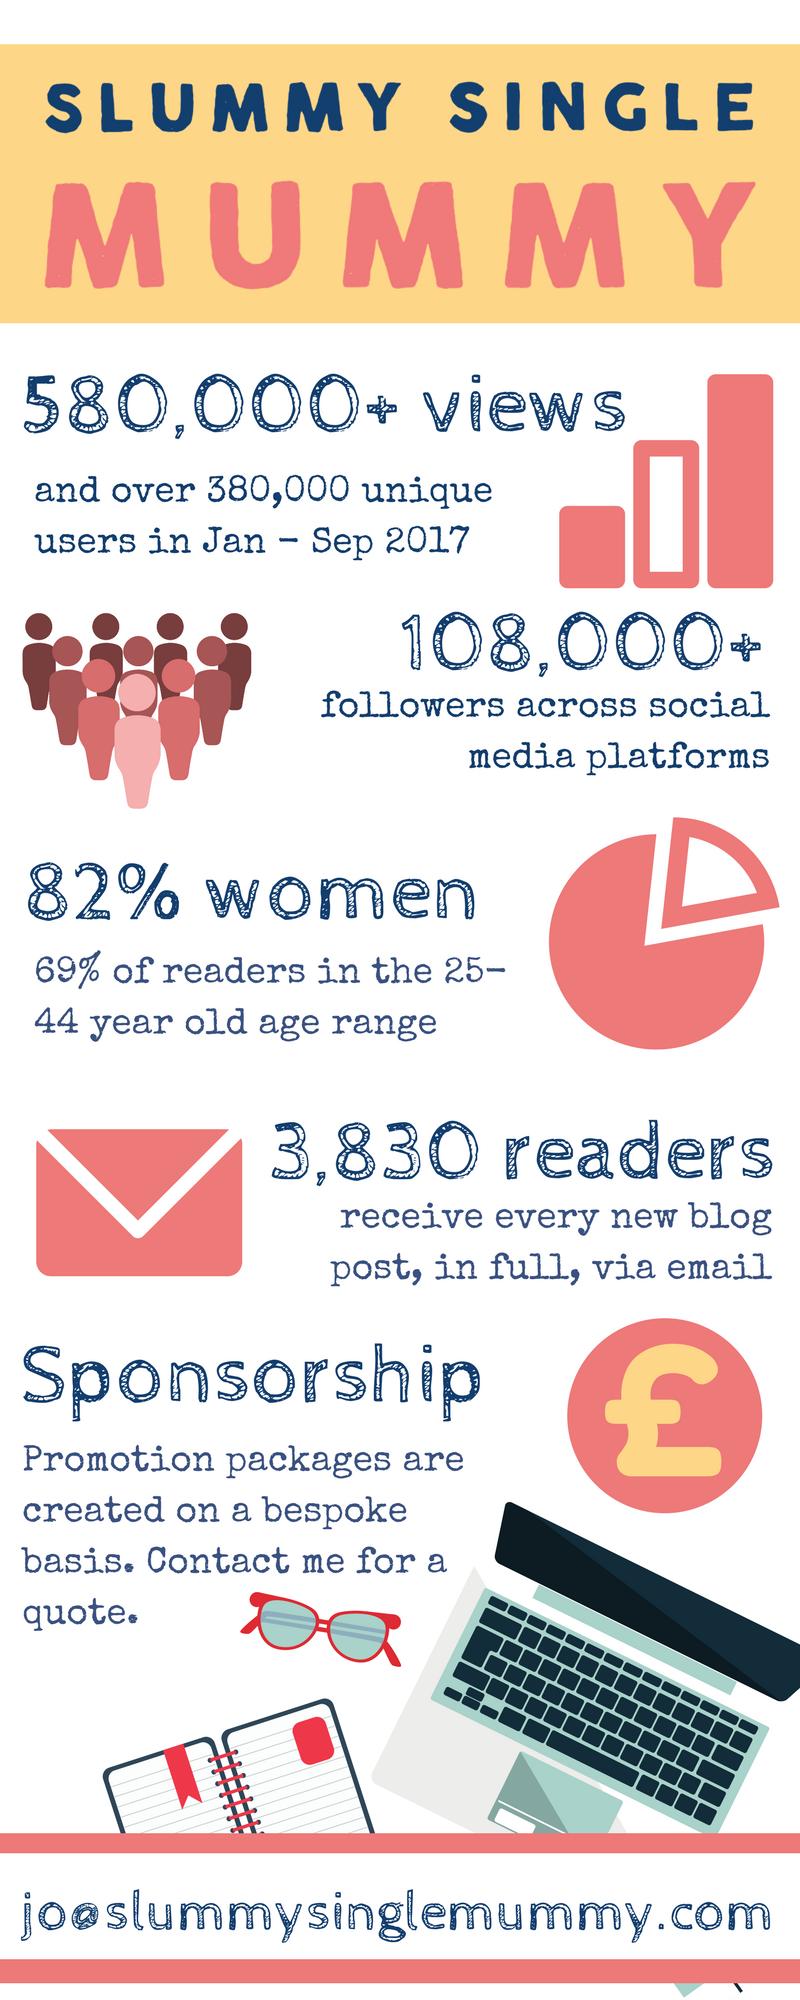 Slummy single mummy blog stats